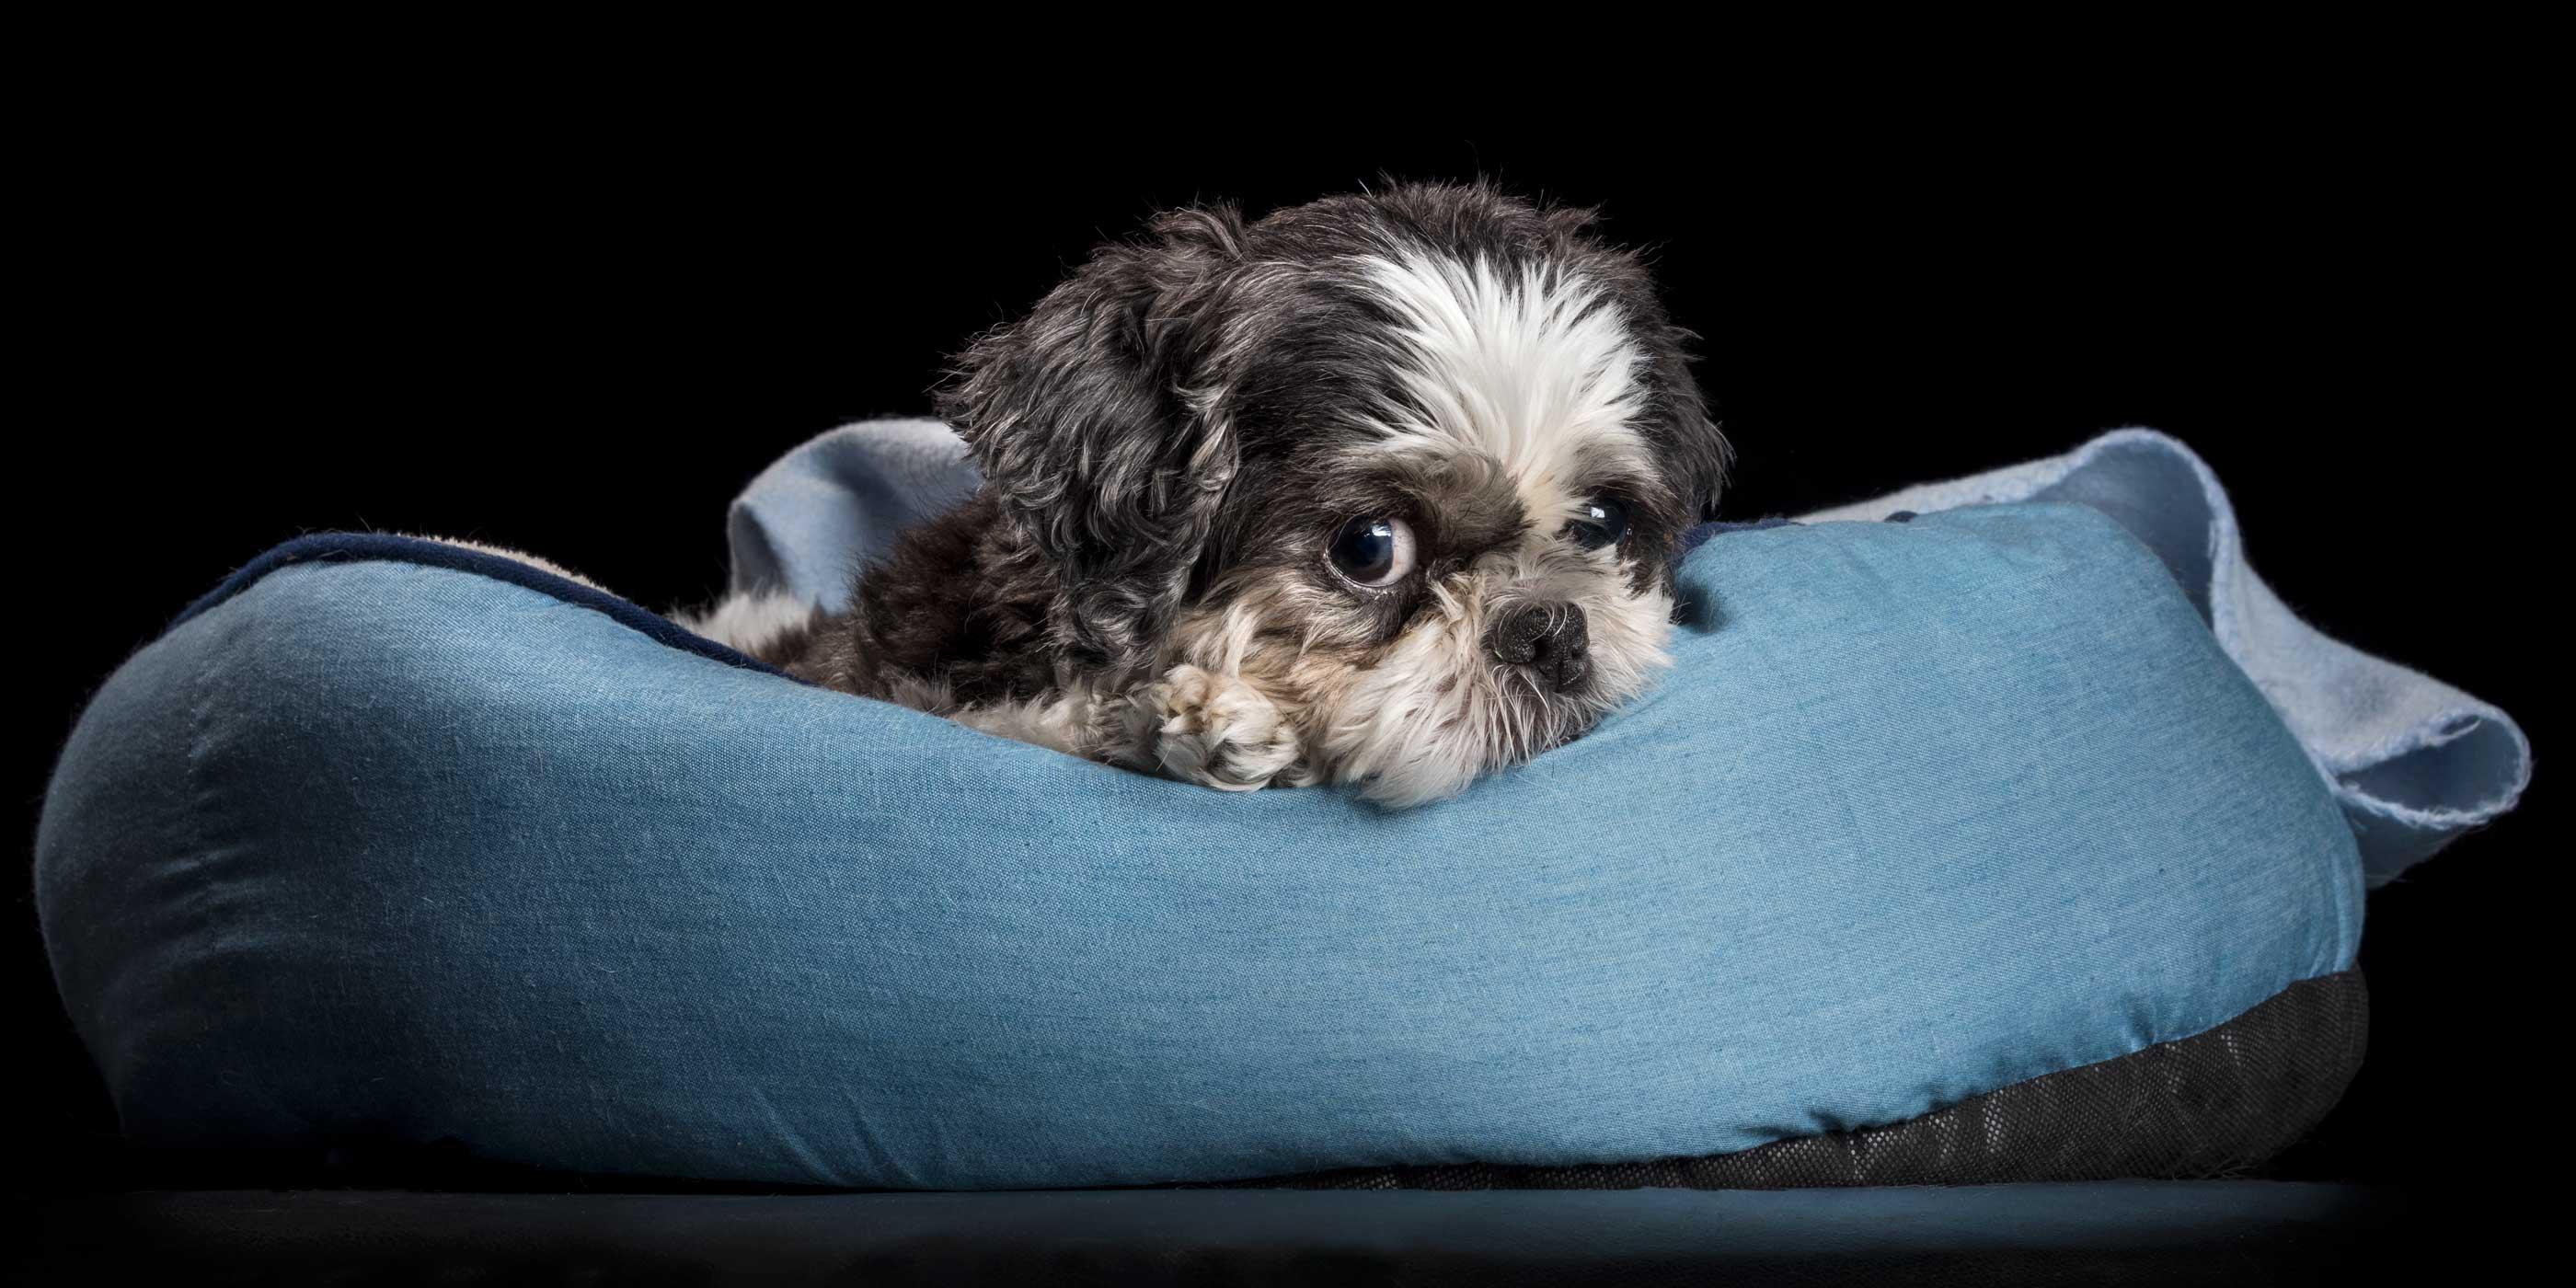 snuggling shih tzu boy on blue blanket